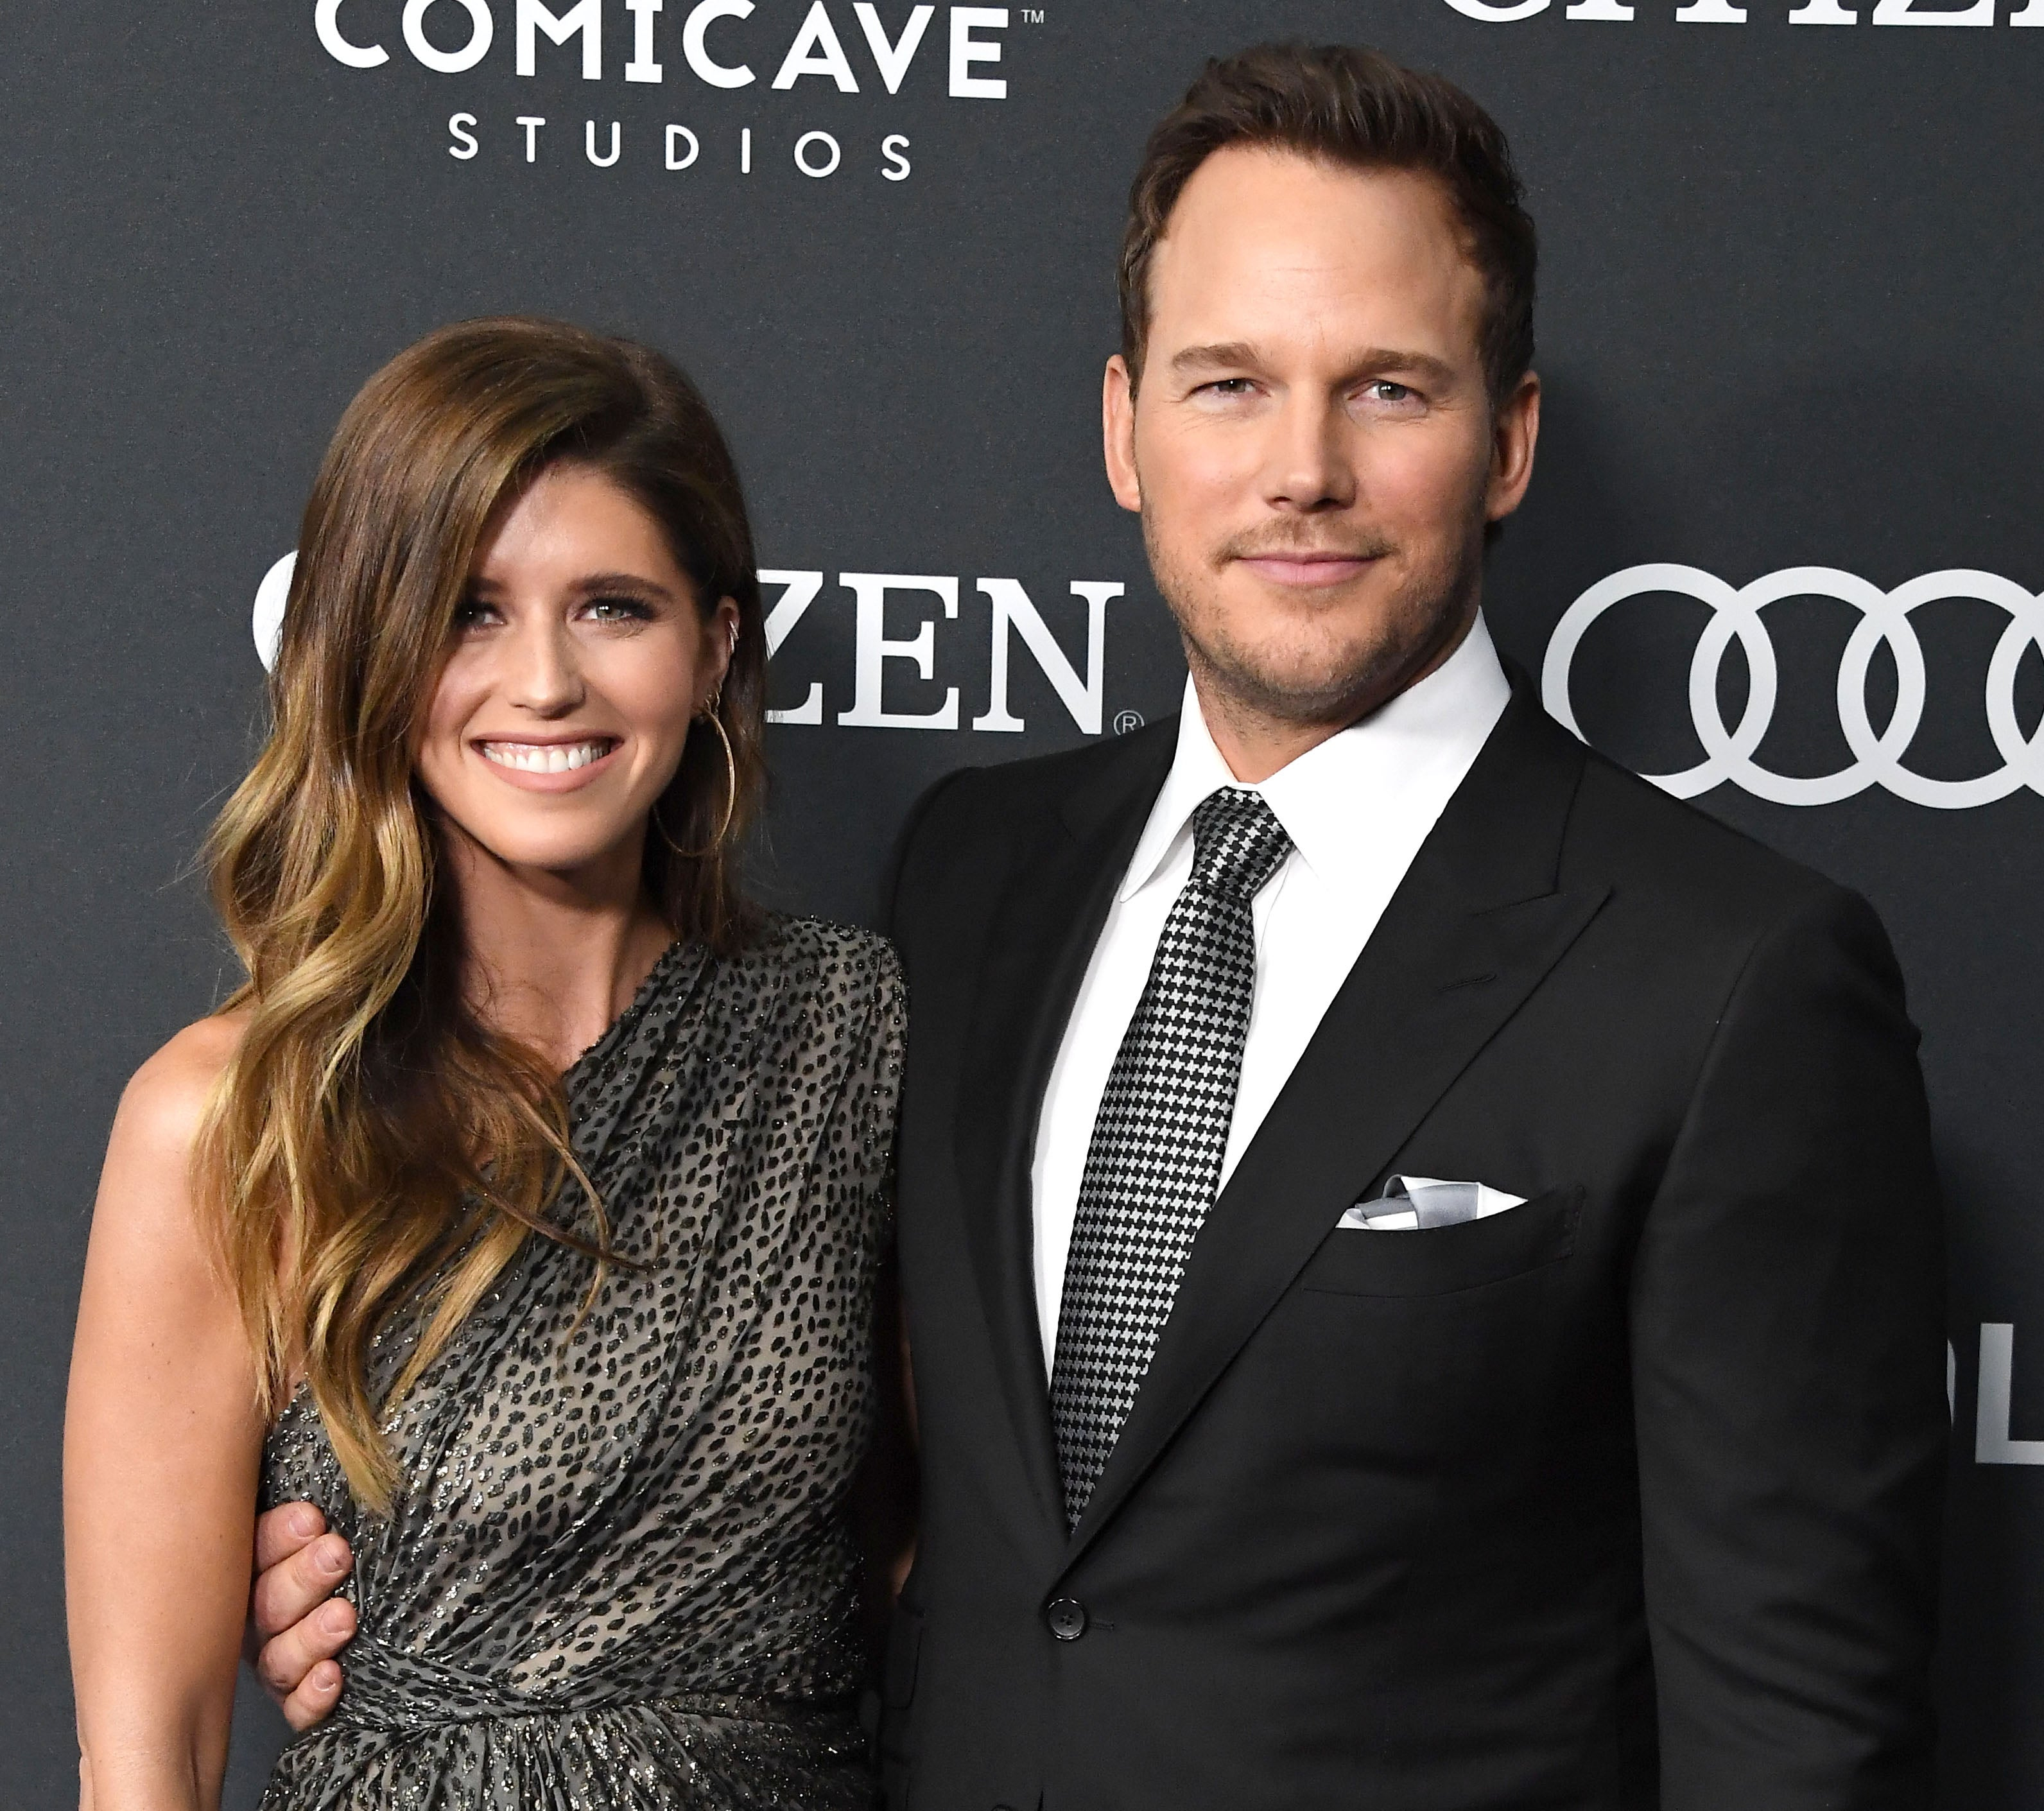 Chris Pratt Sends Sweet Birthday Wishes to Wife Katherine Schwarzenegger